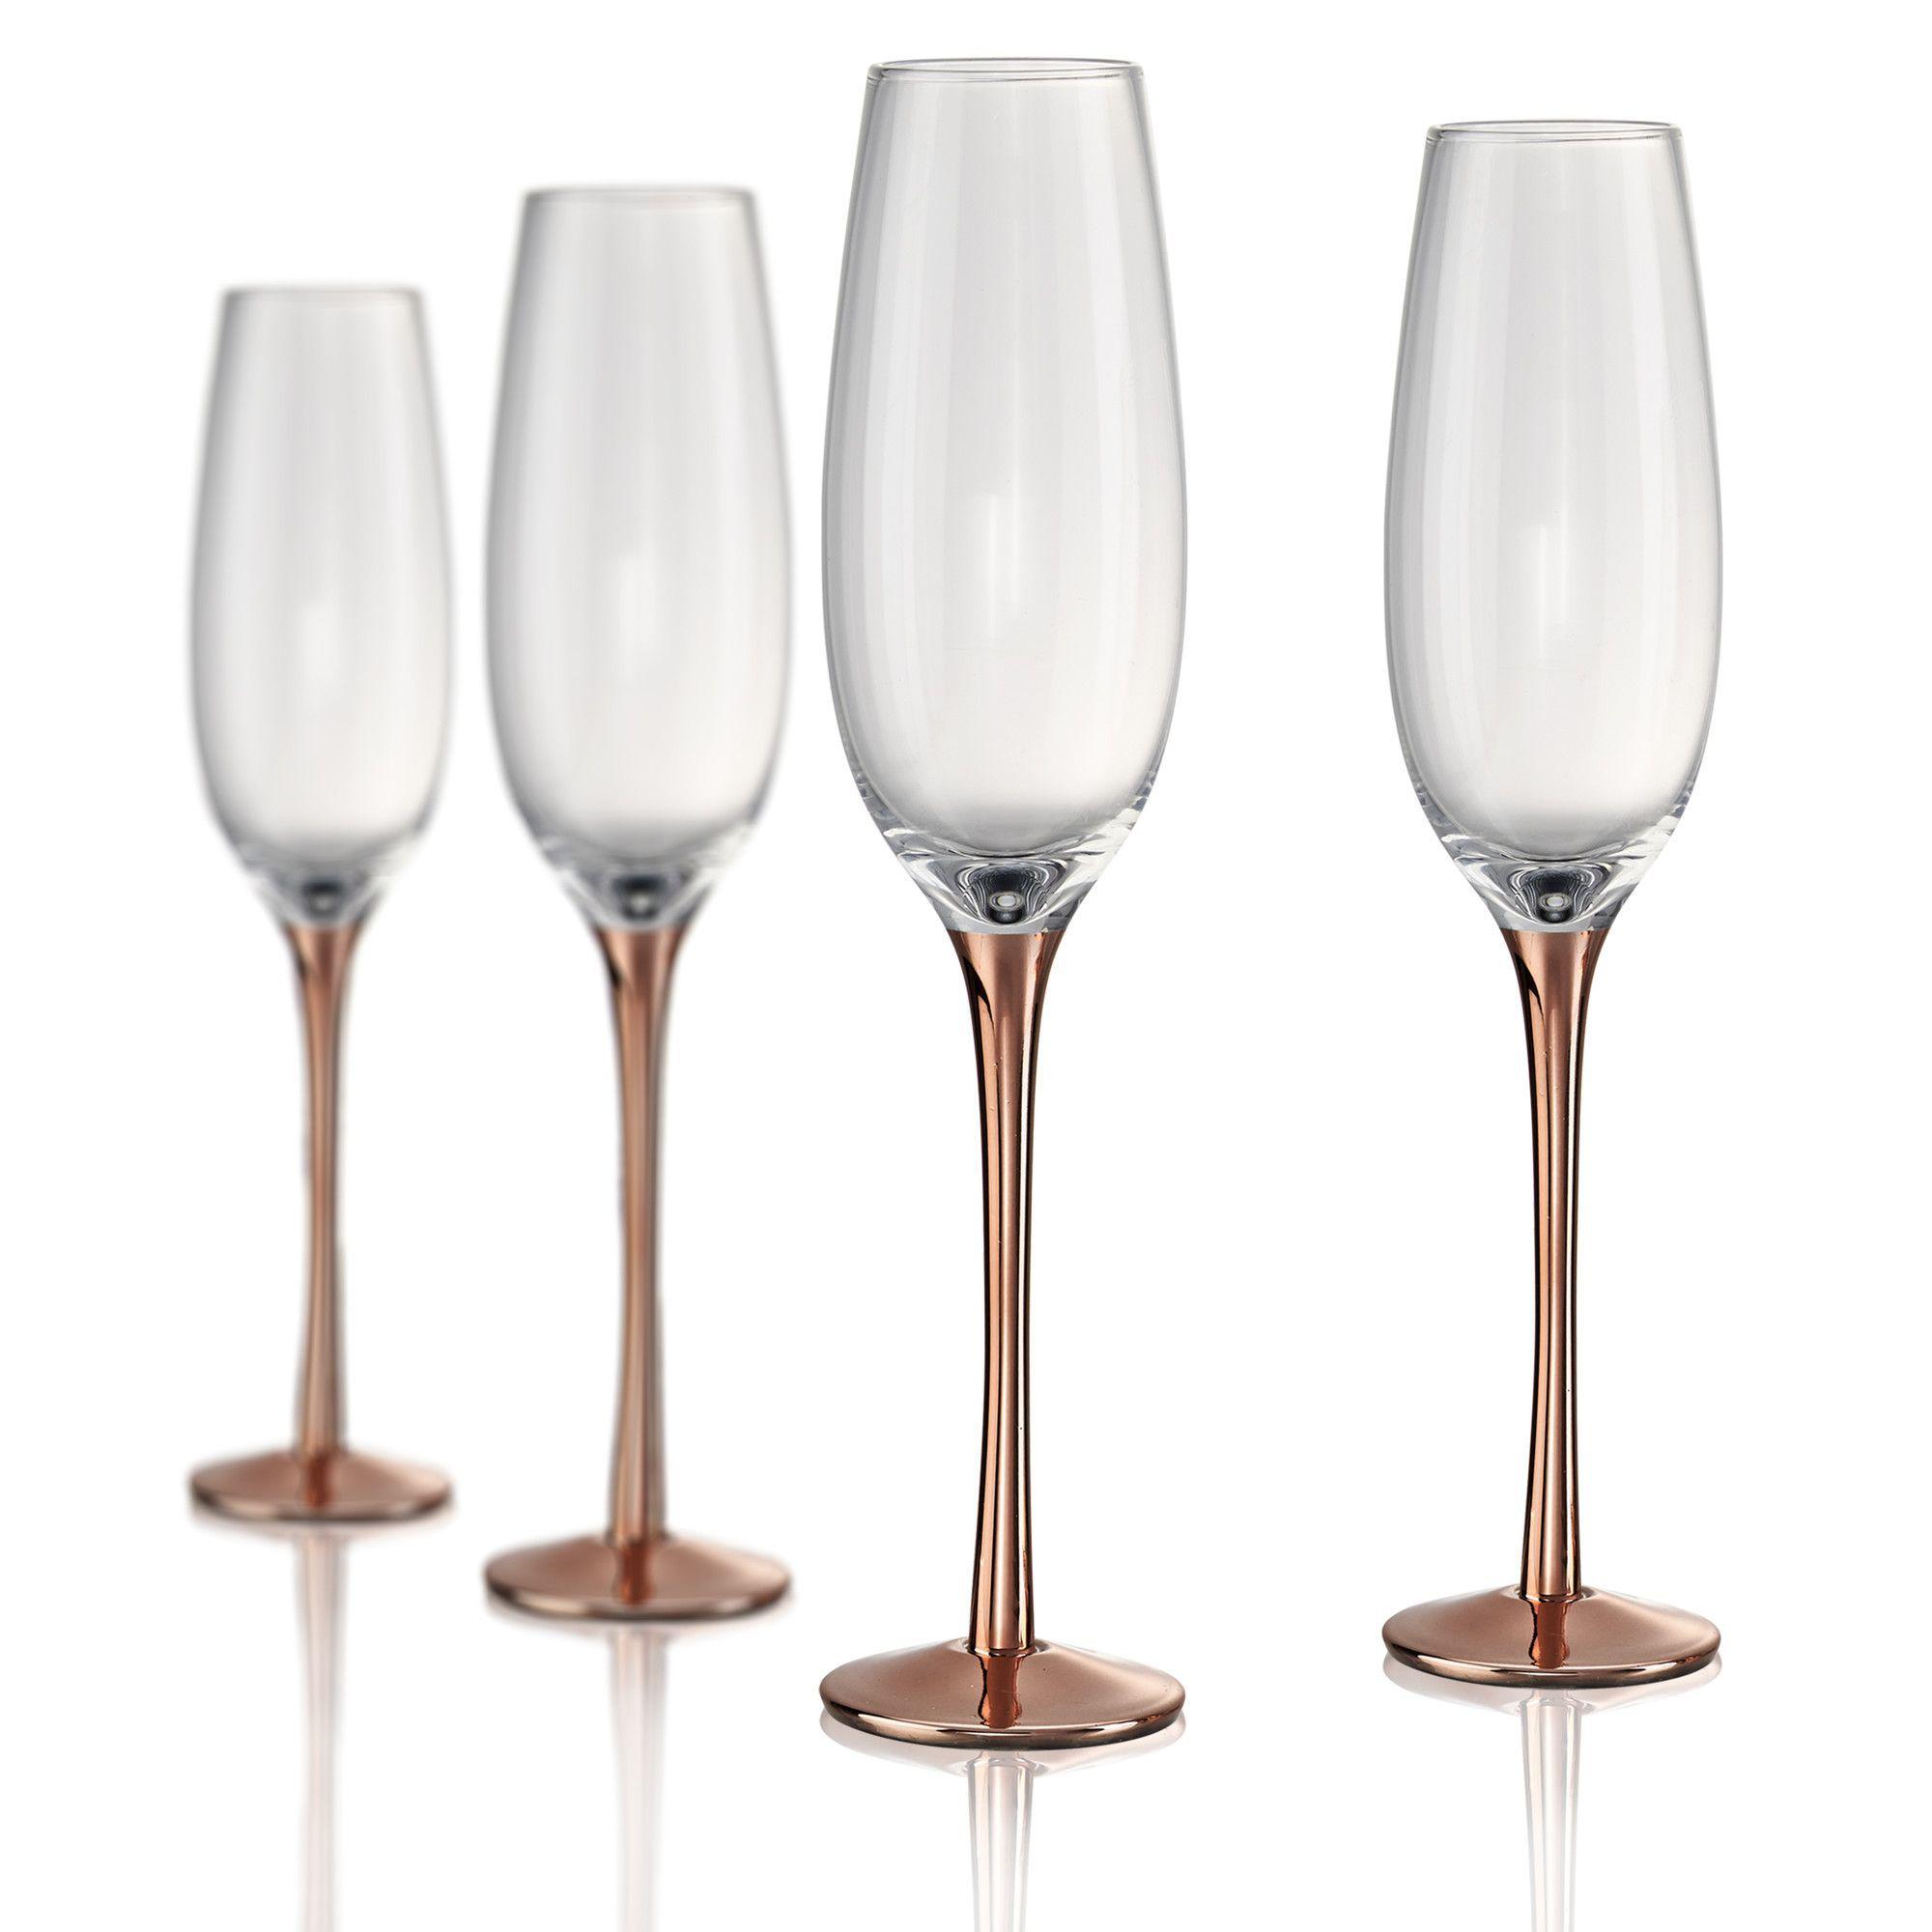 Artland Coppertino Champagne Flute (Set of 4) | Wedding | Pinterest ...